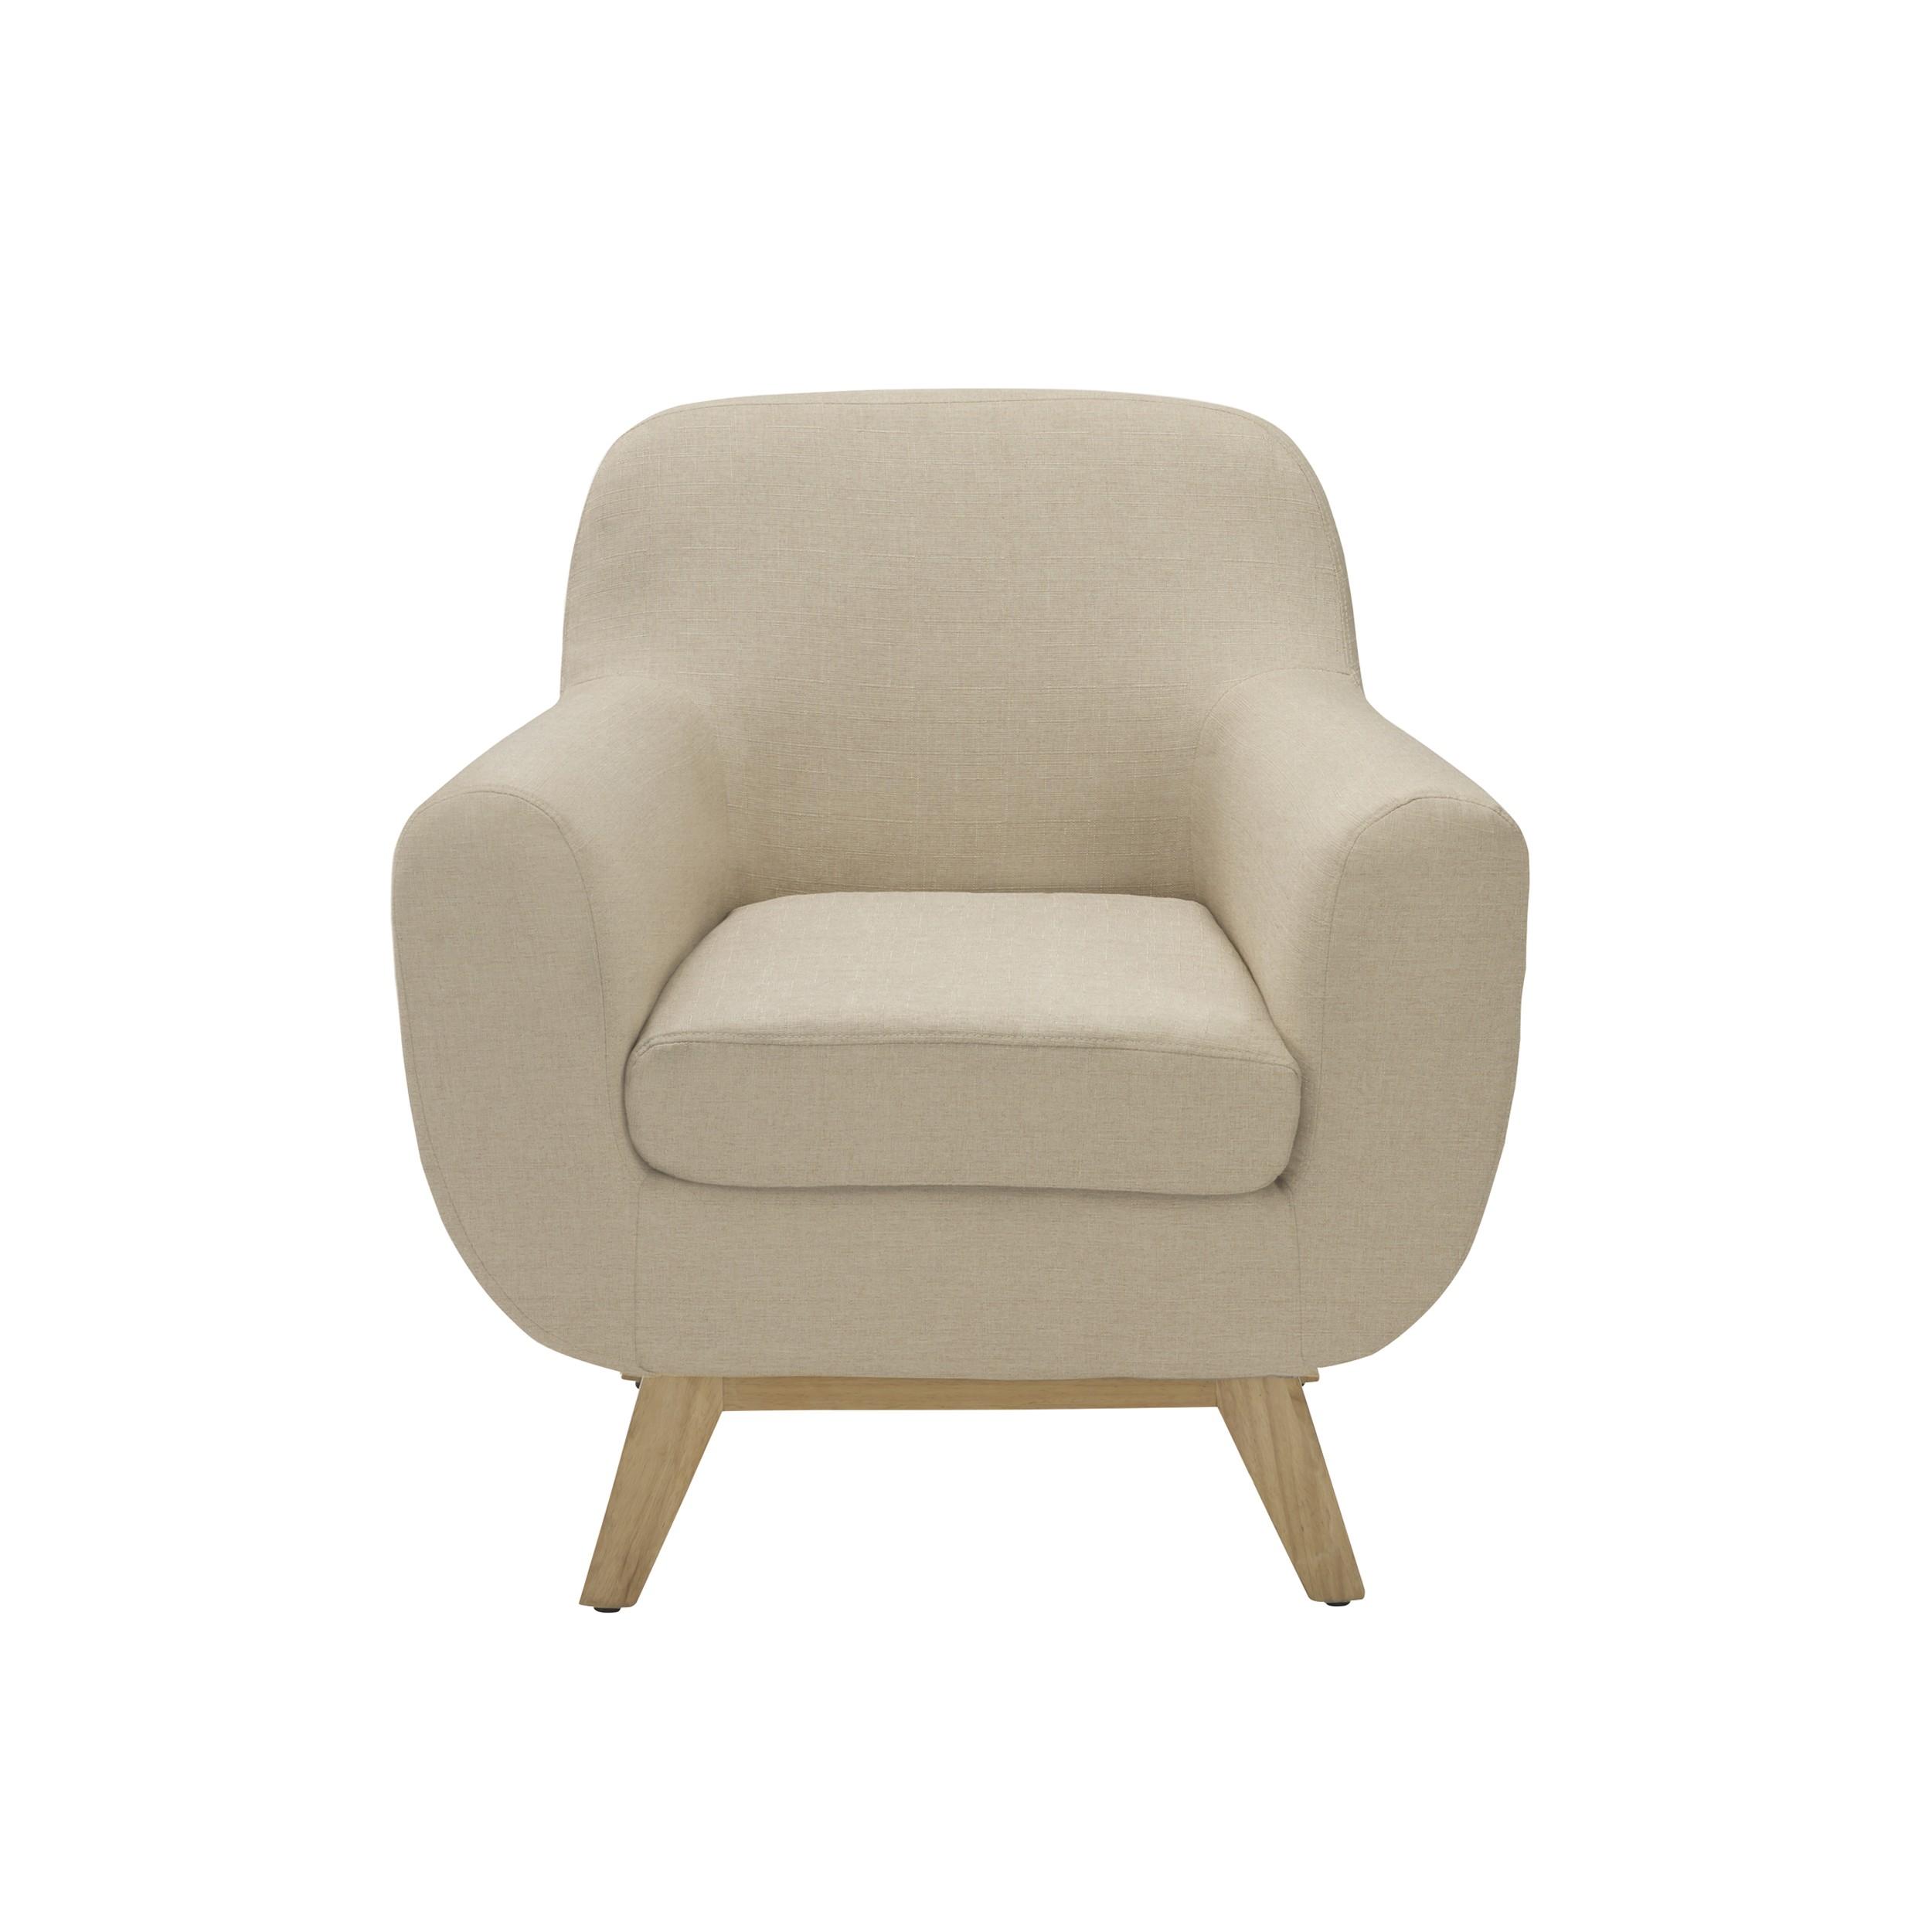 achat fauteuil tissu beige prix mini - Fauteuil En Tissu